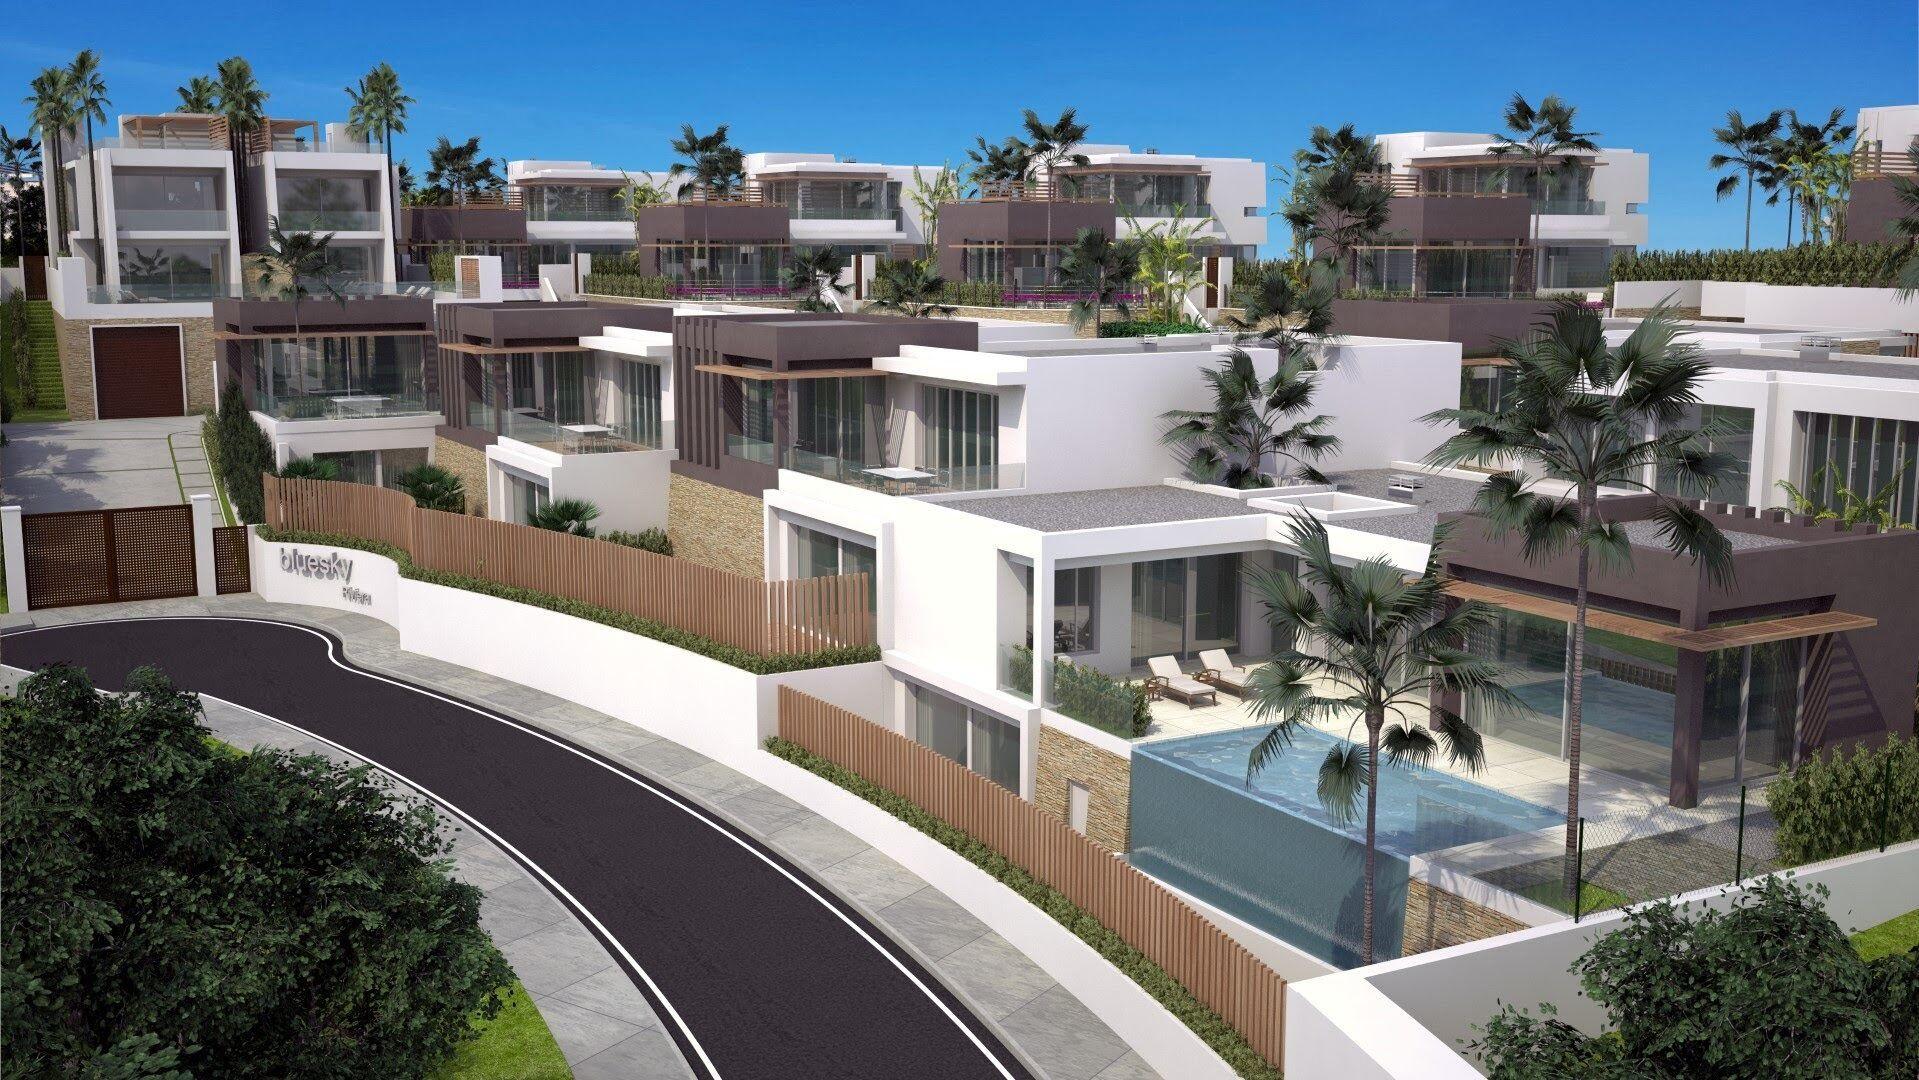 Luxury modern design villas in gated community for sale in Rivera del Sol - Mijas Costa – Mijas